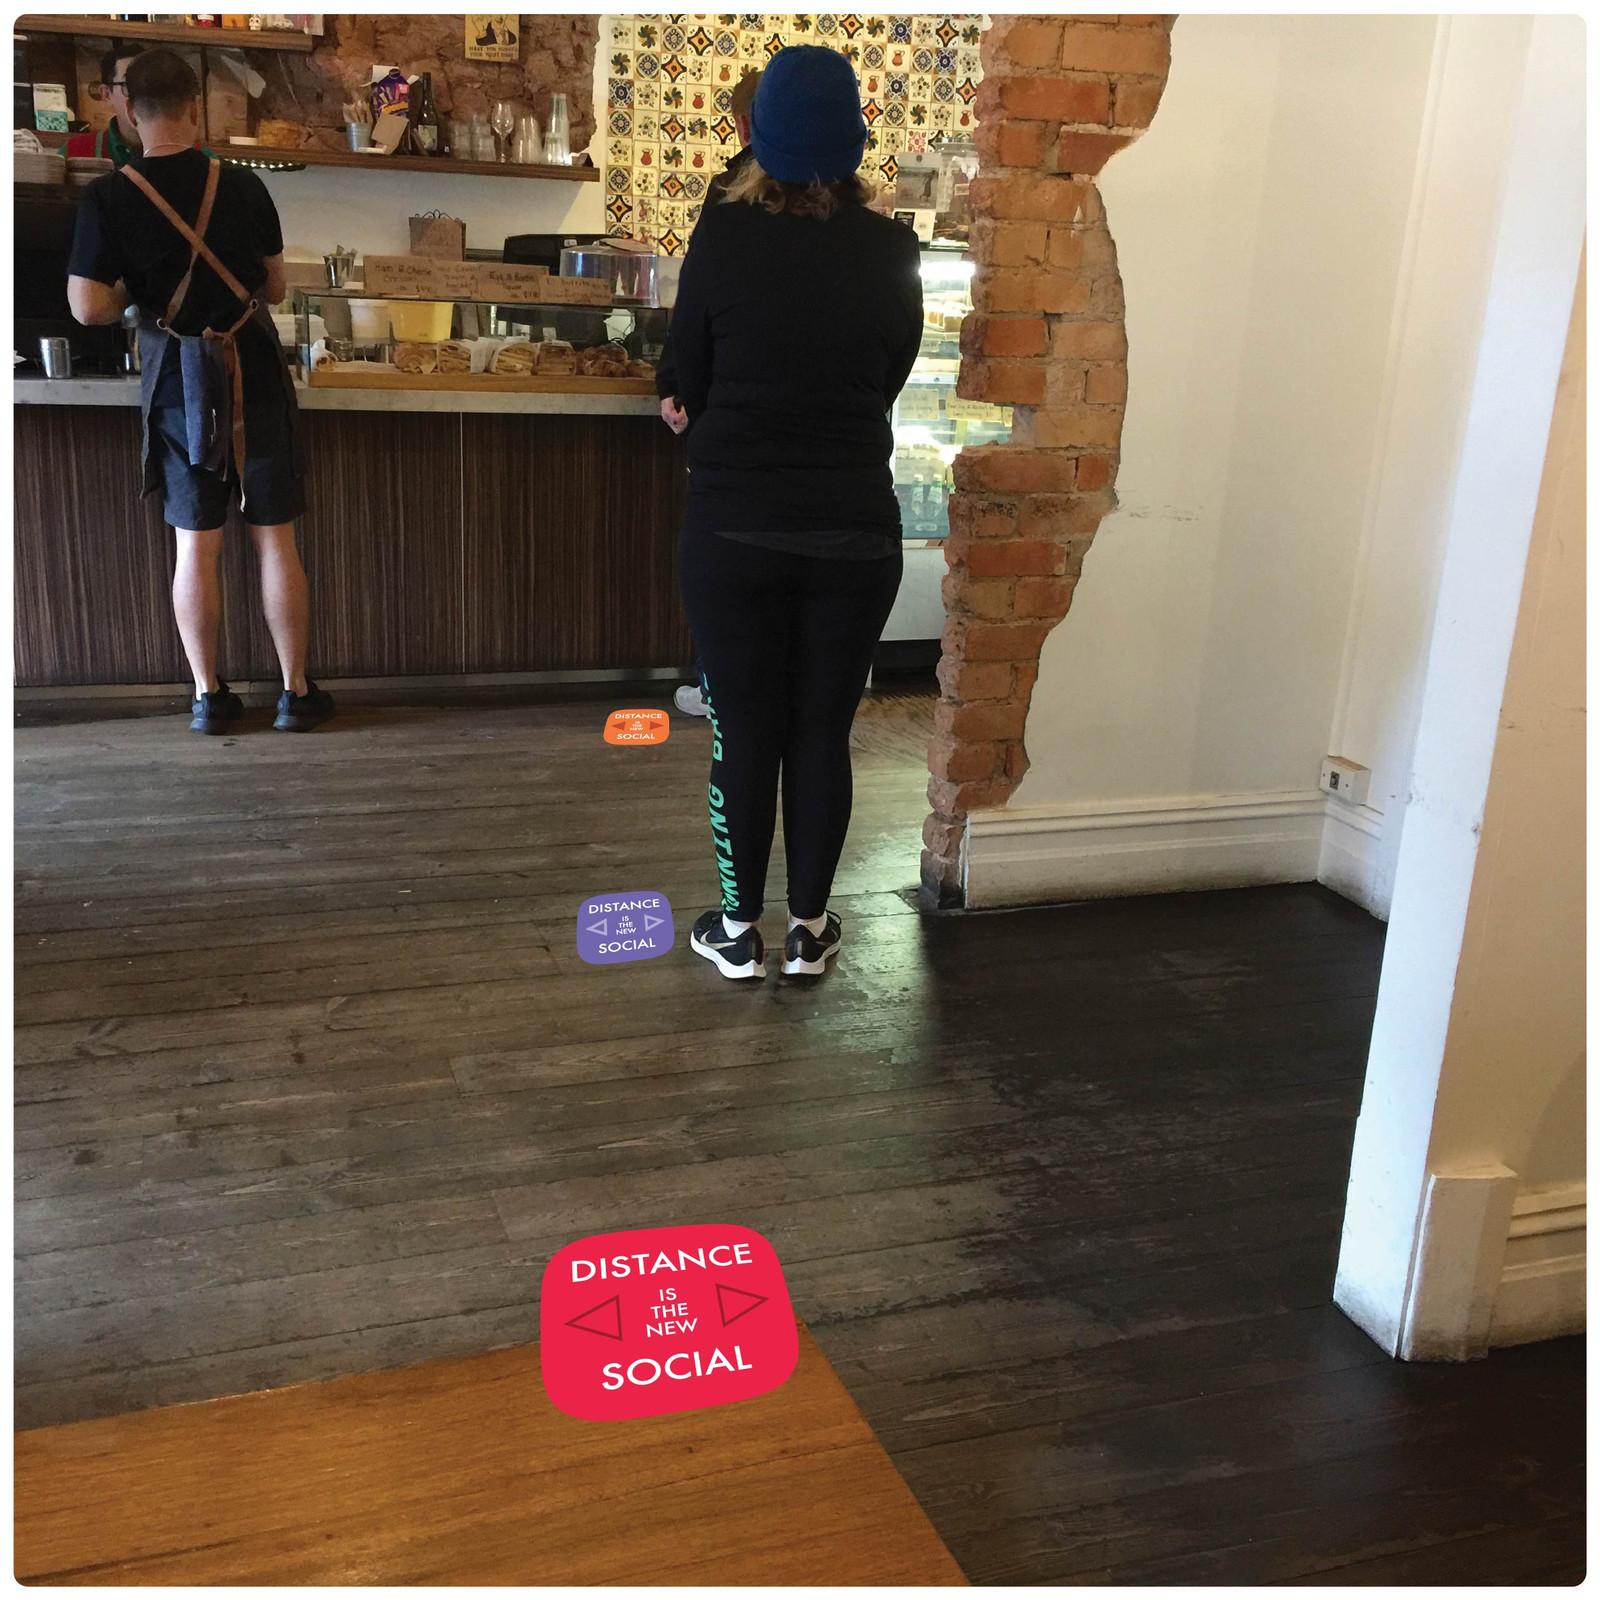 social distancing floor marker for hard floors, photo, contemporary, mix Self-adhesive Corona virus floor marker to help social distancing